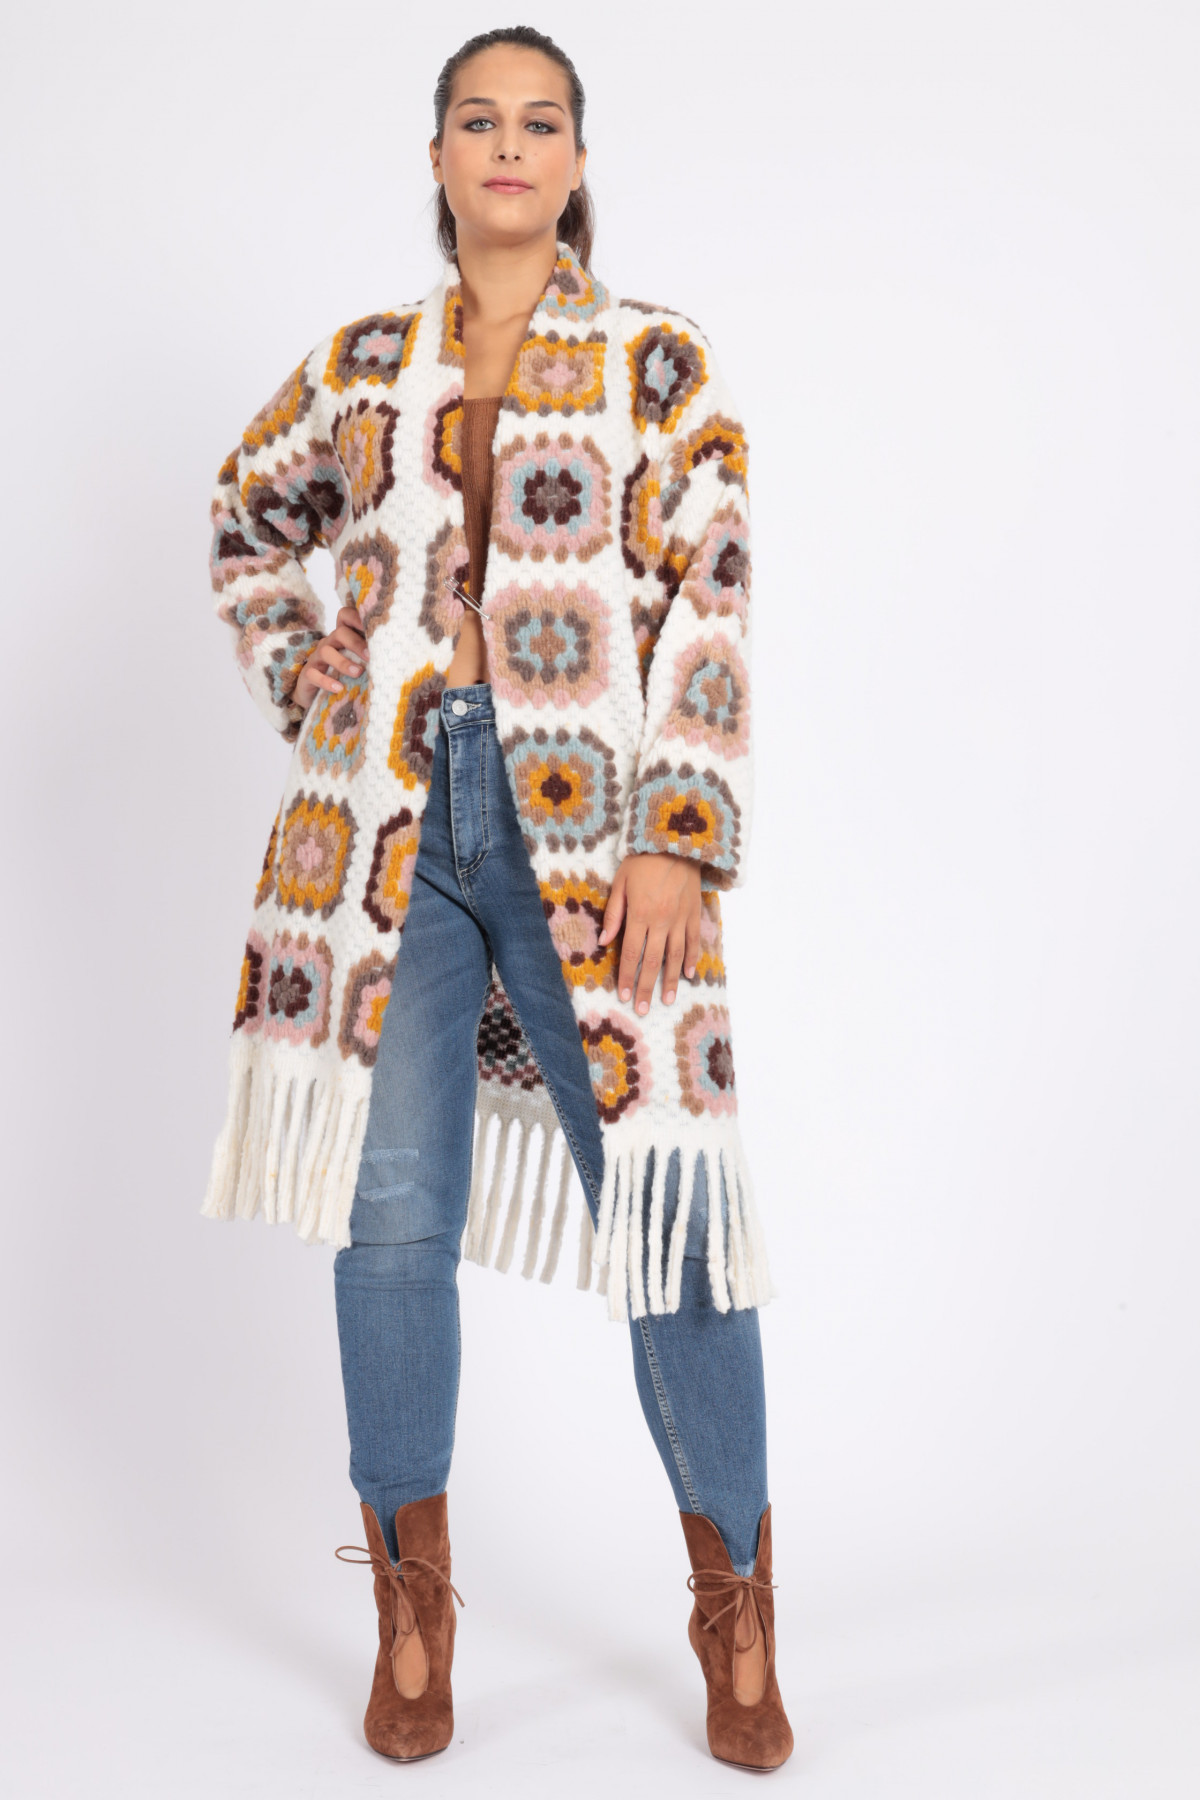 Crochet Patterned Jacket with Fringes